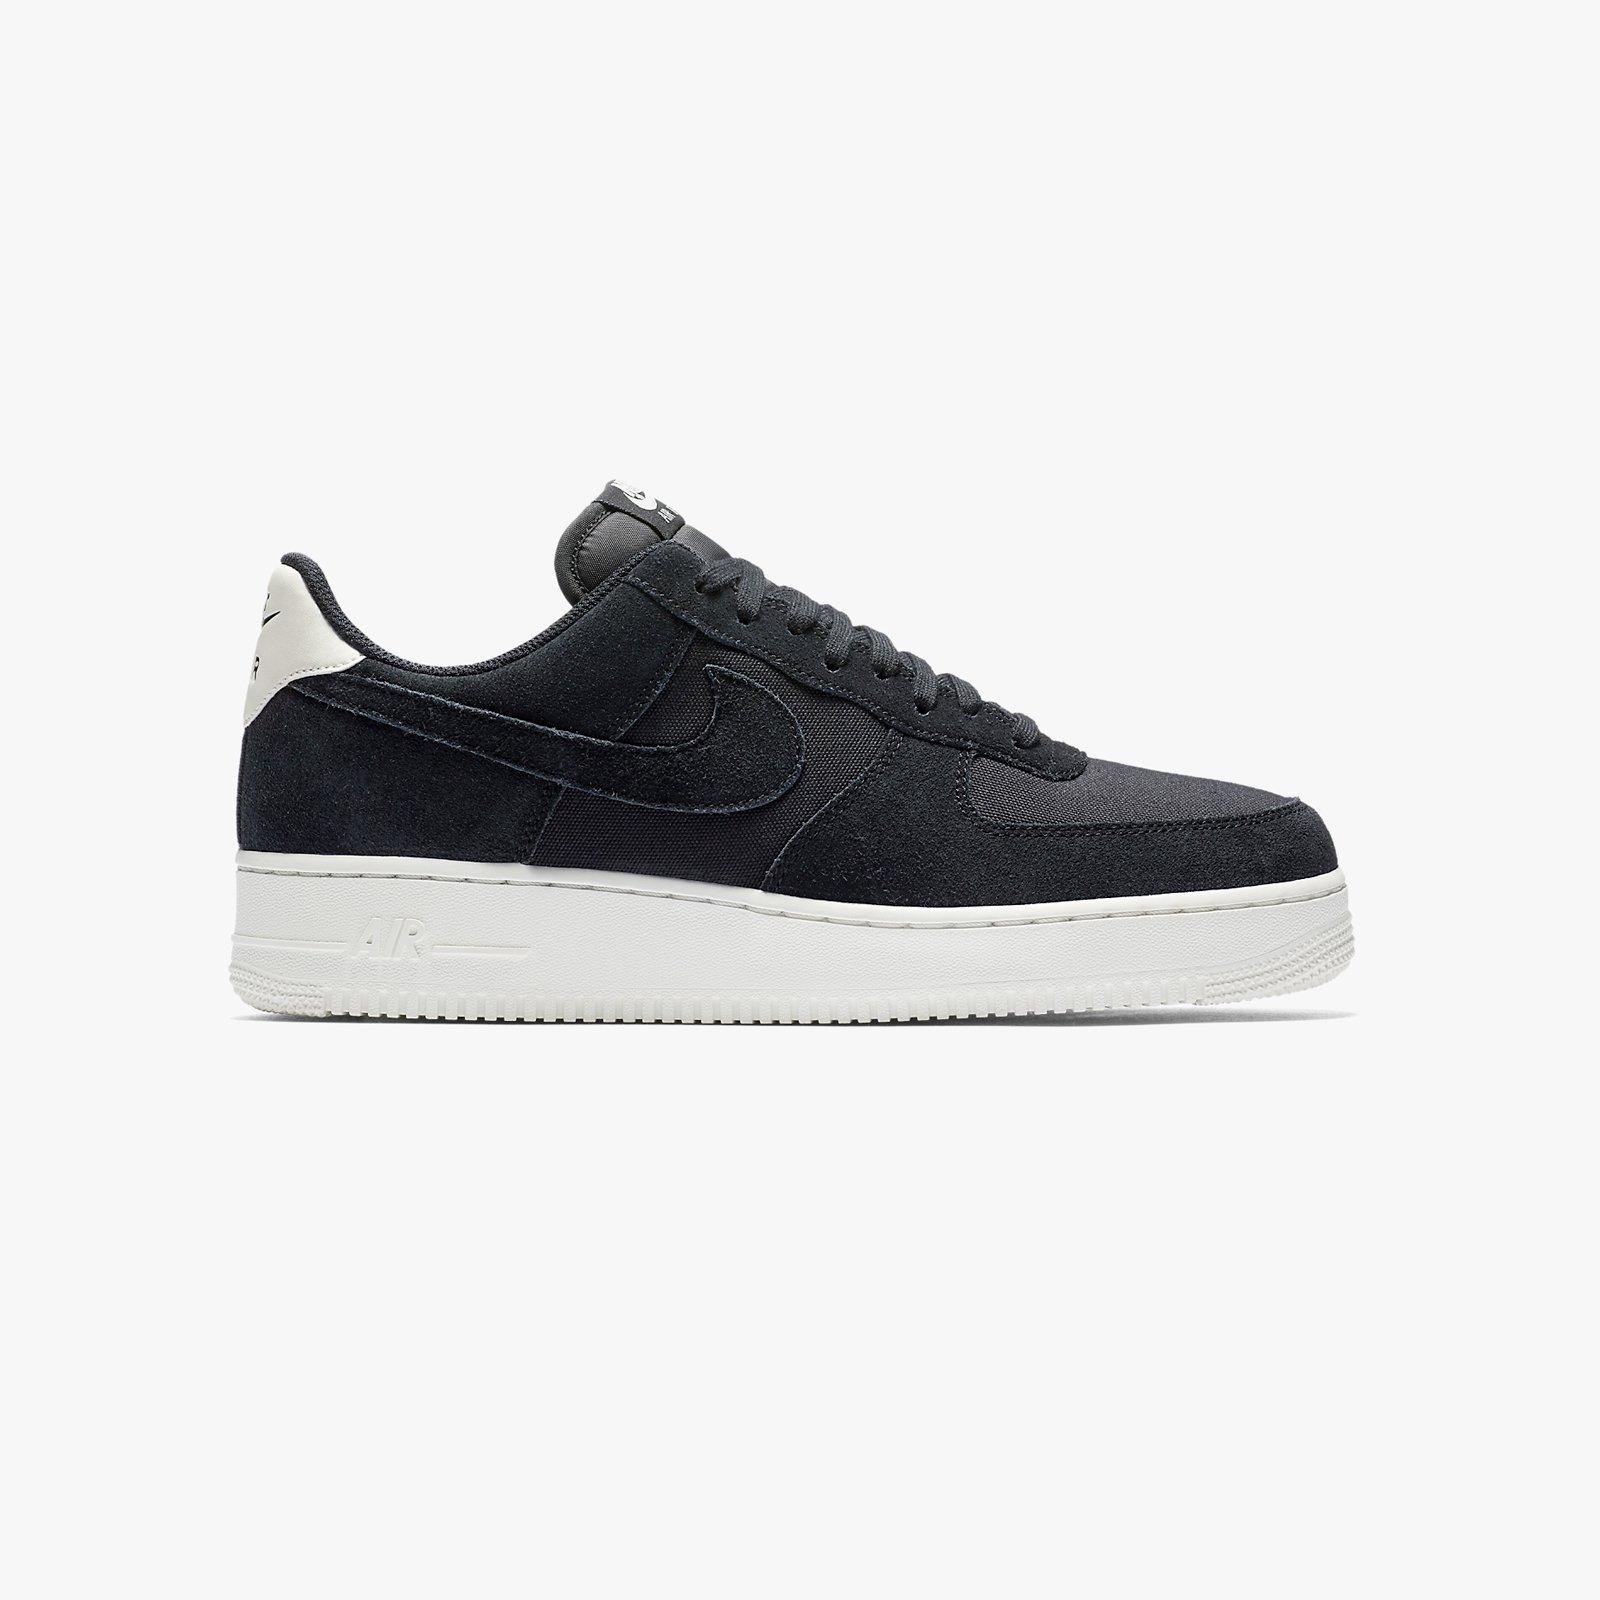 Nike Air Force 1 07 Suede Ao3835 001 Sneakersnstuff